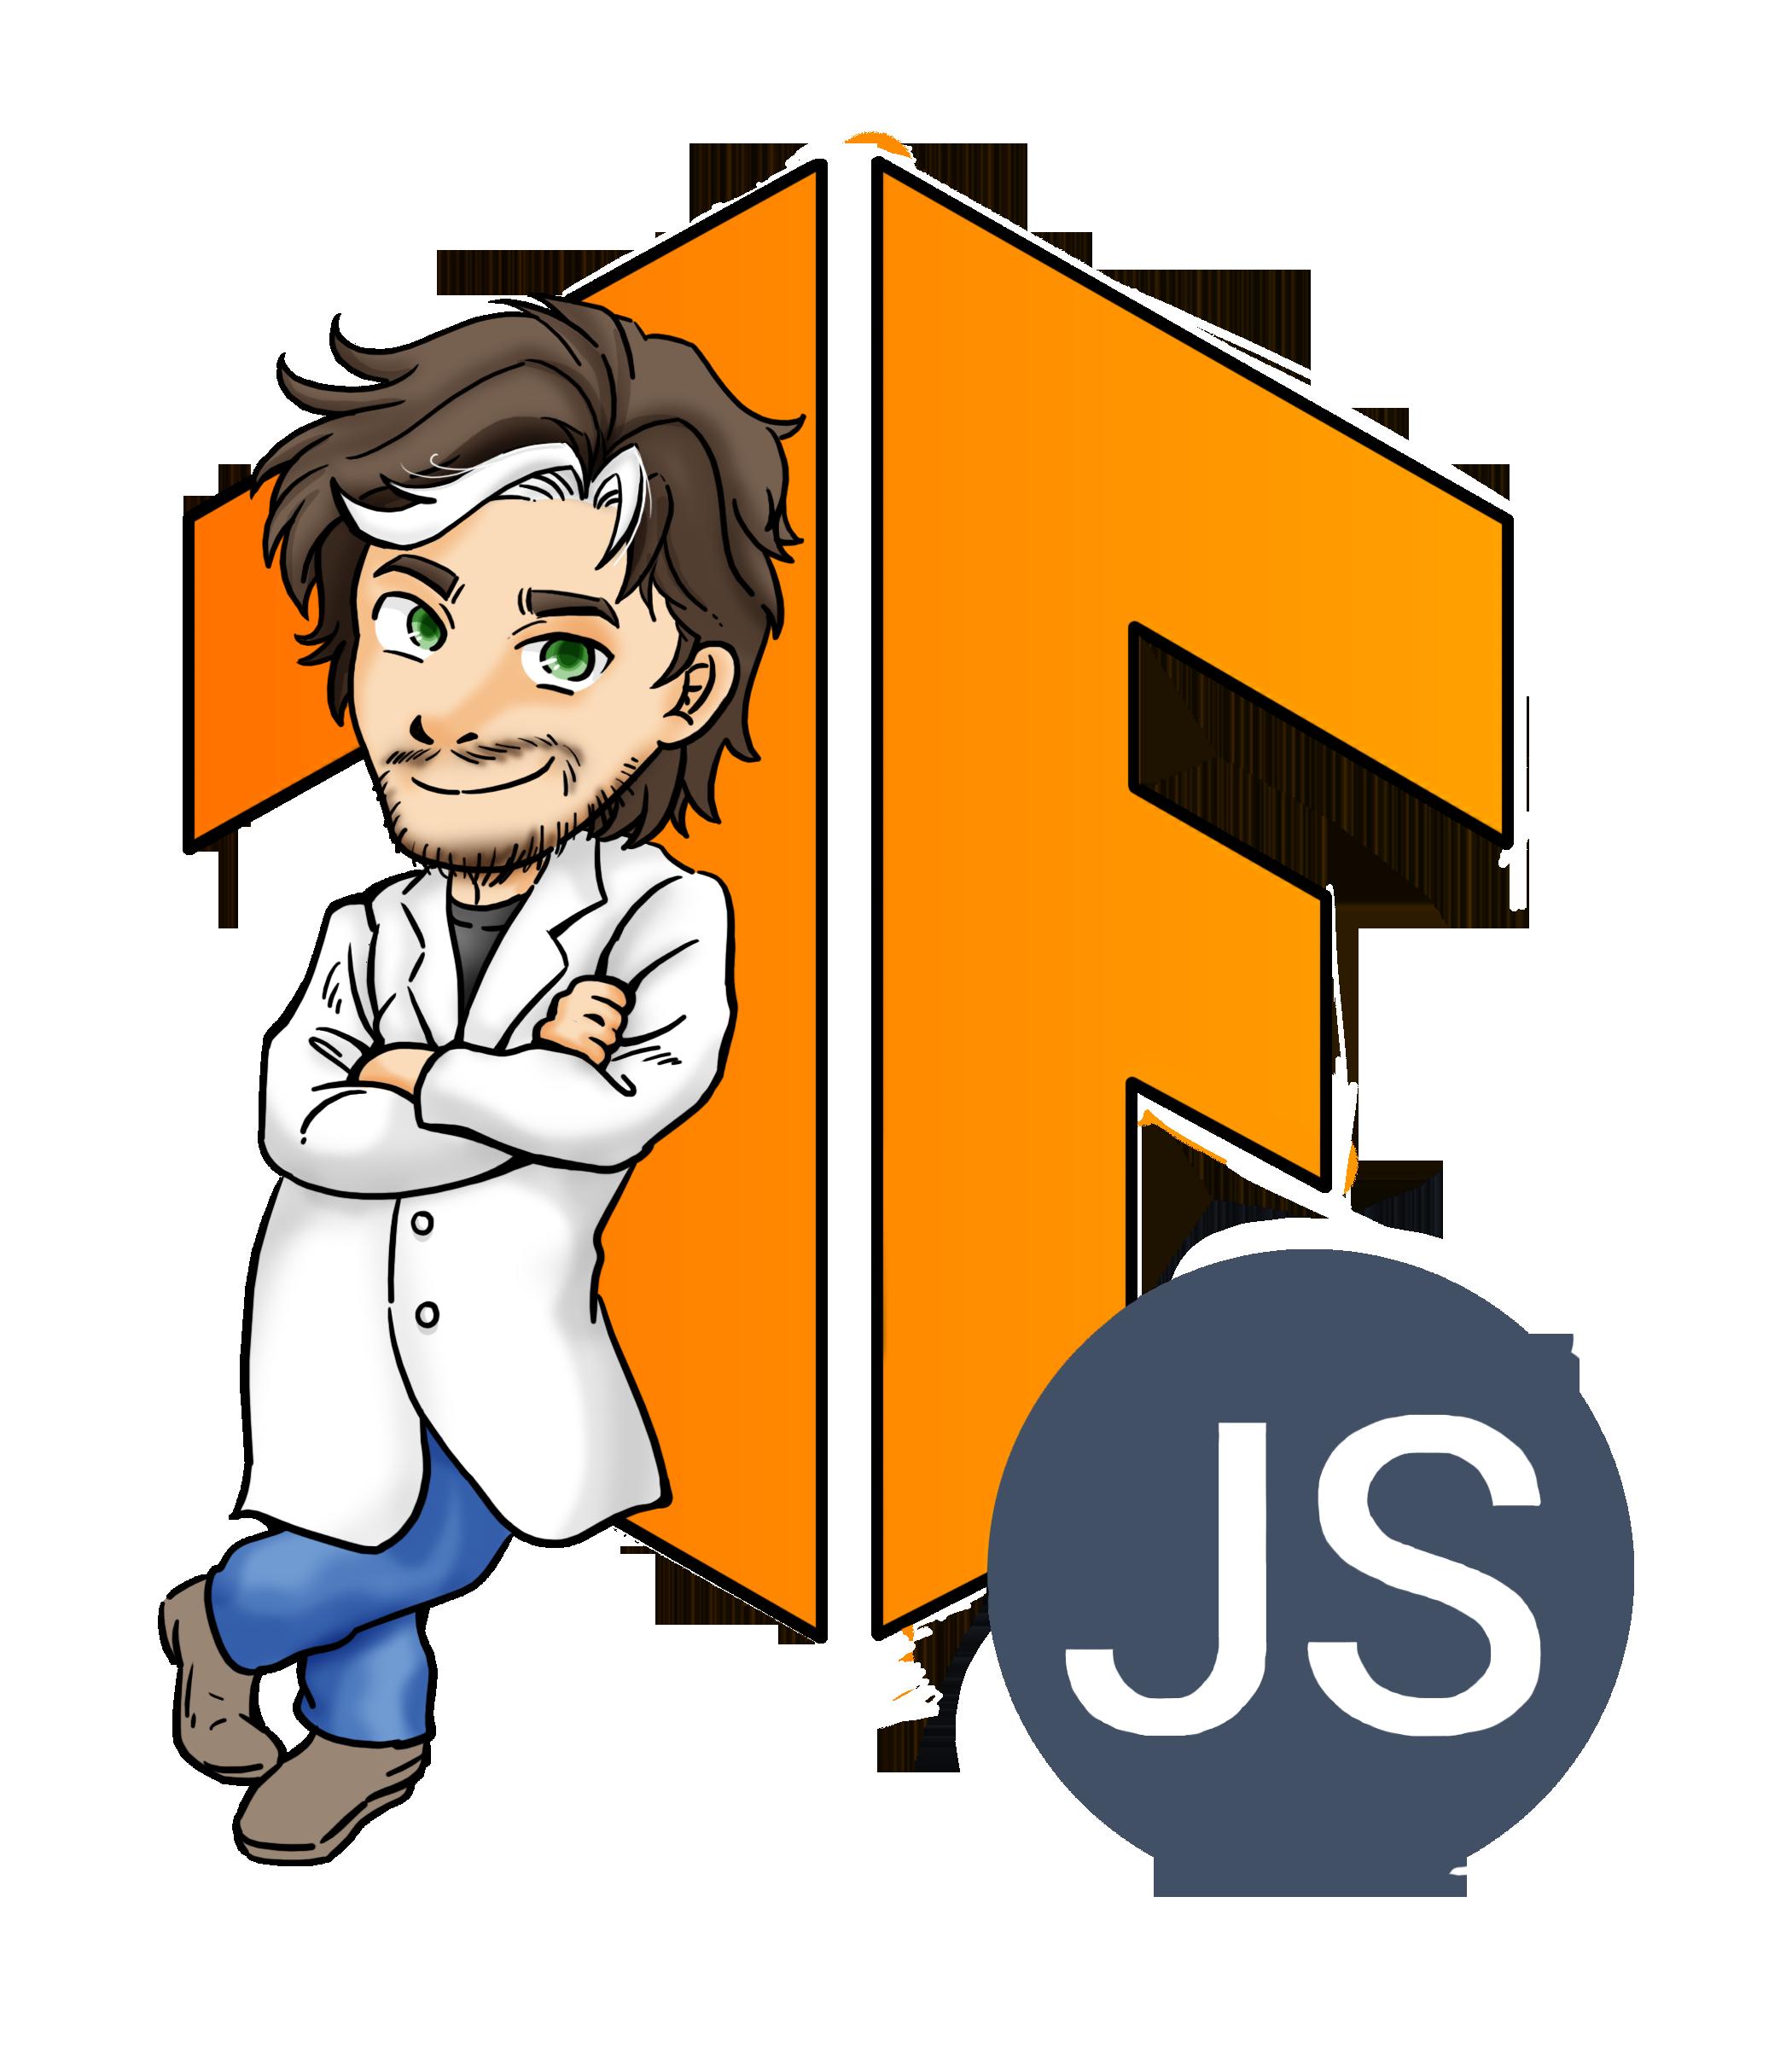 TFJS TensorflowJS logo with Gant